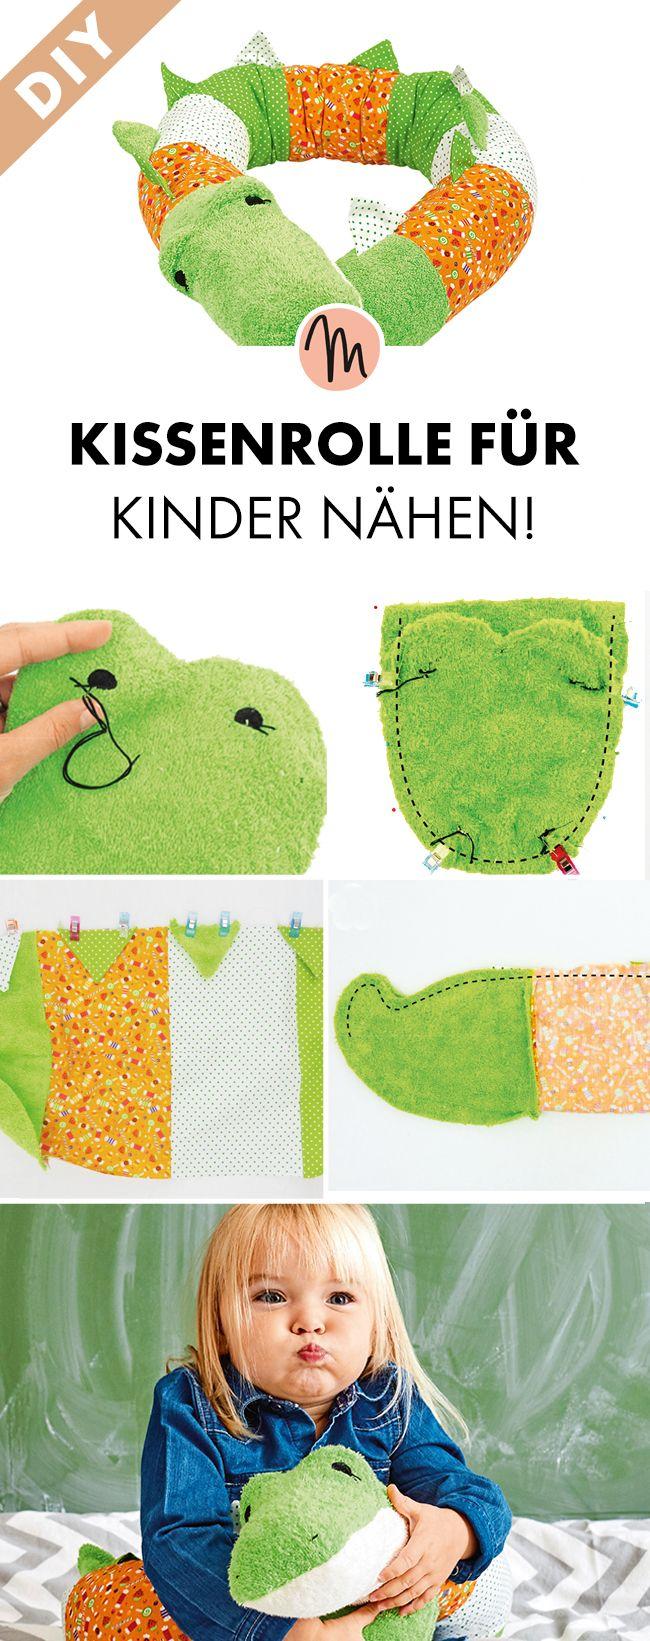 Krokodil-Kissenrolle für Kinder nähen! | Kostenlos nähen, Kinder ...